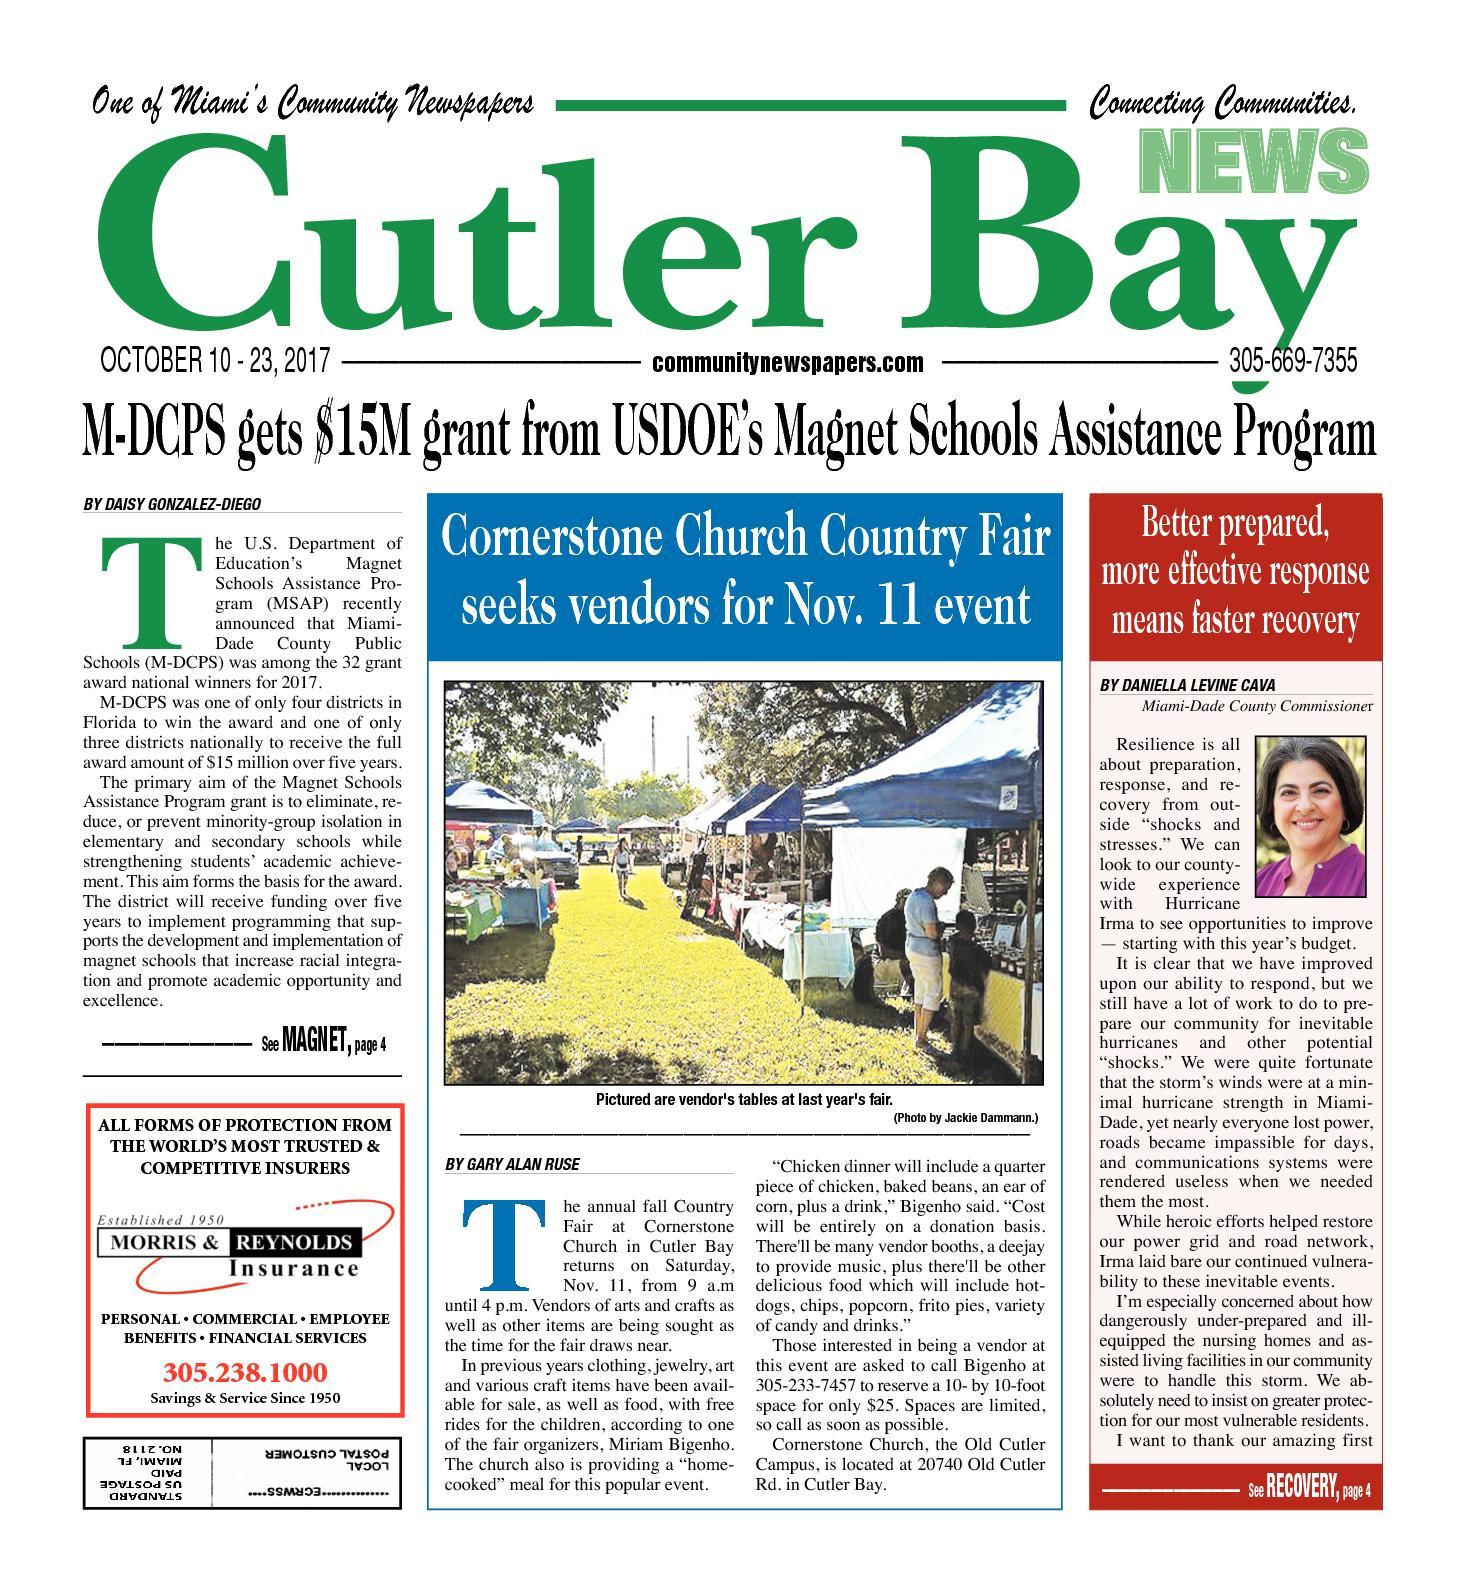 Calaméo - Cutler Bay News 10 10 2017